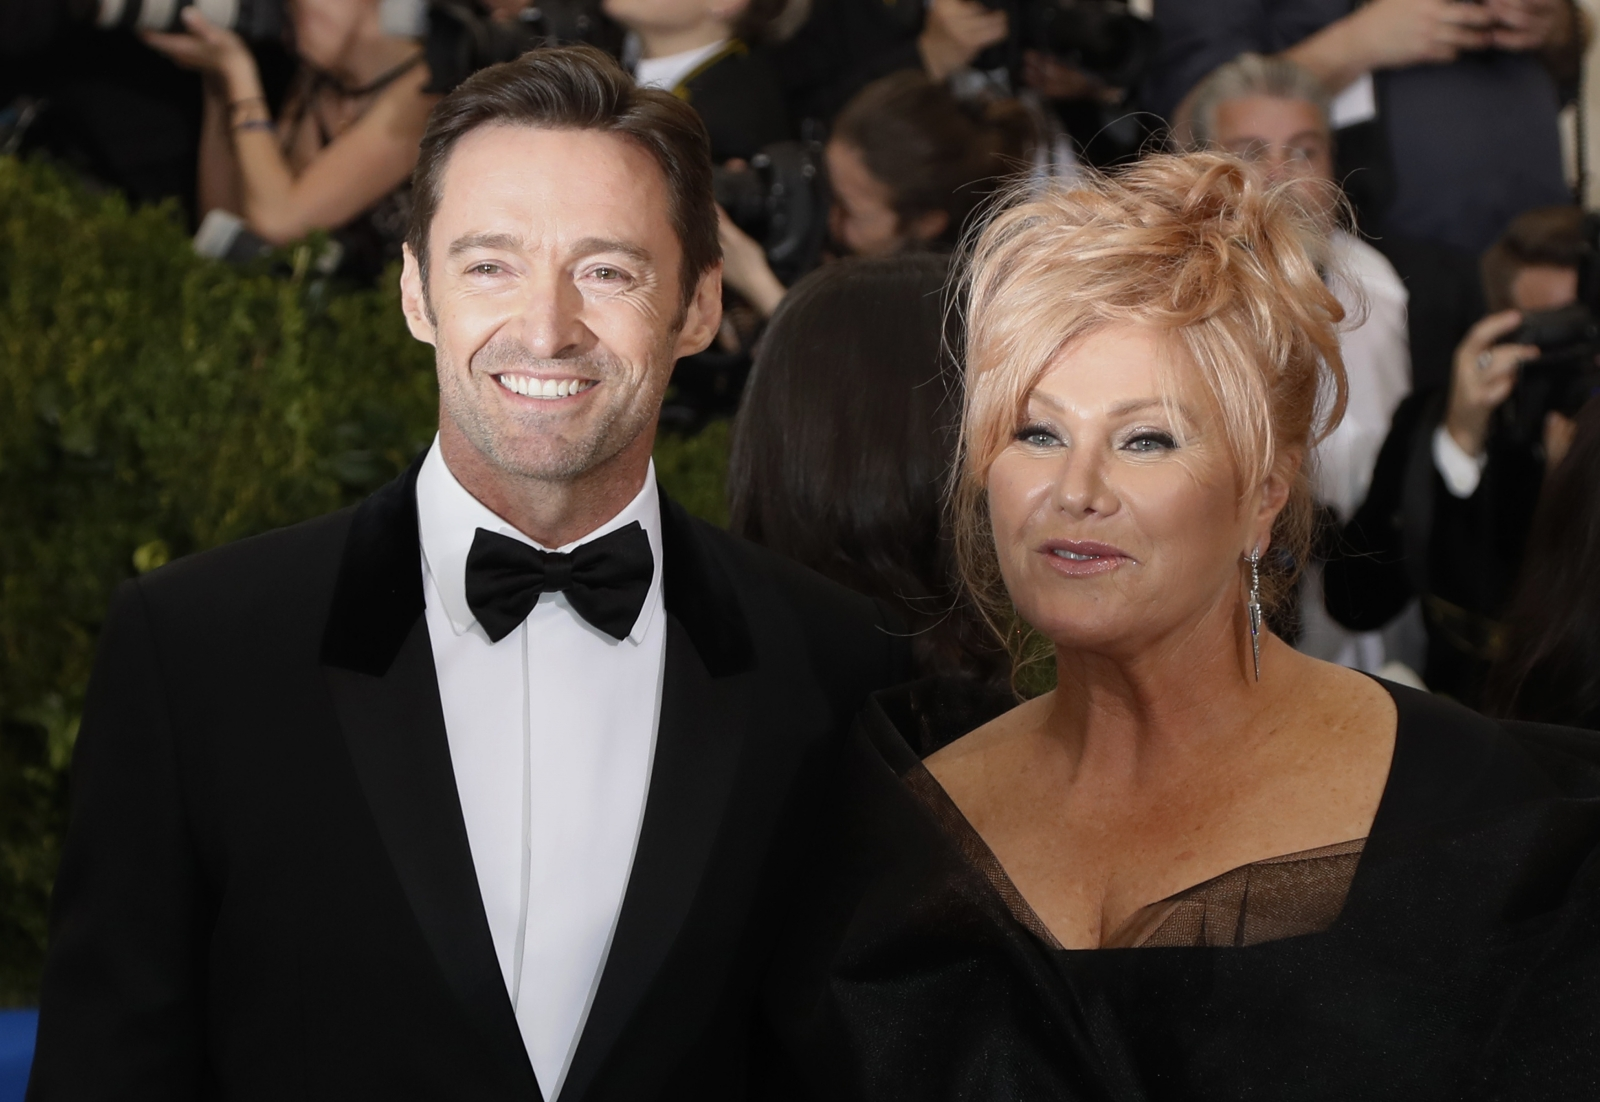 Hugh Jackman and Deborra Lee-Furness